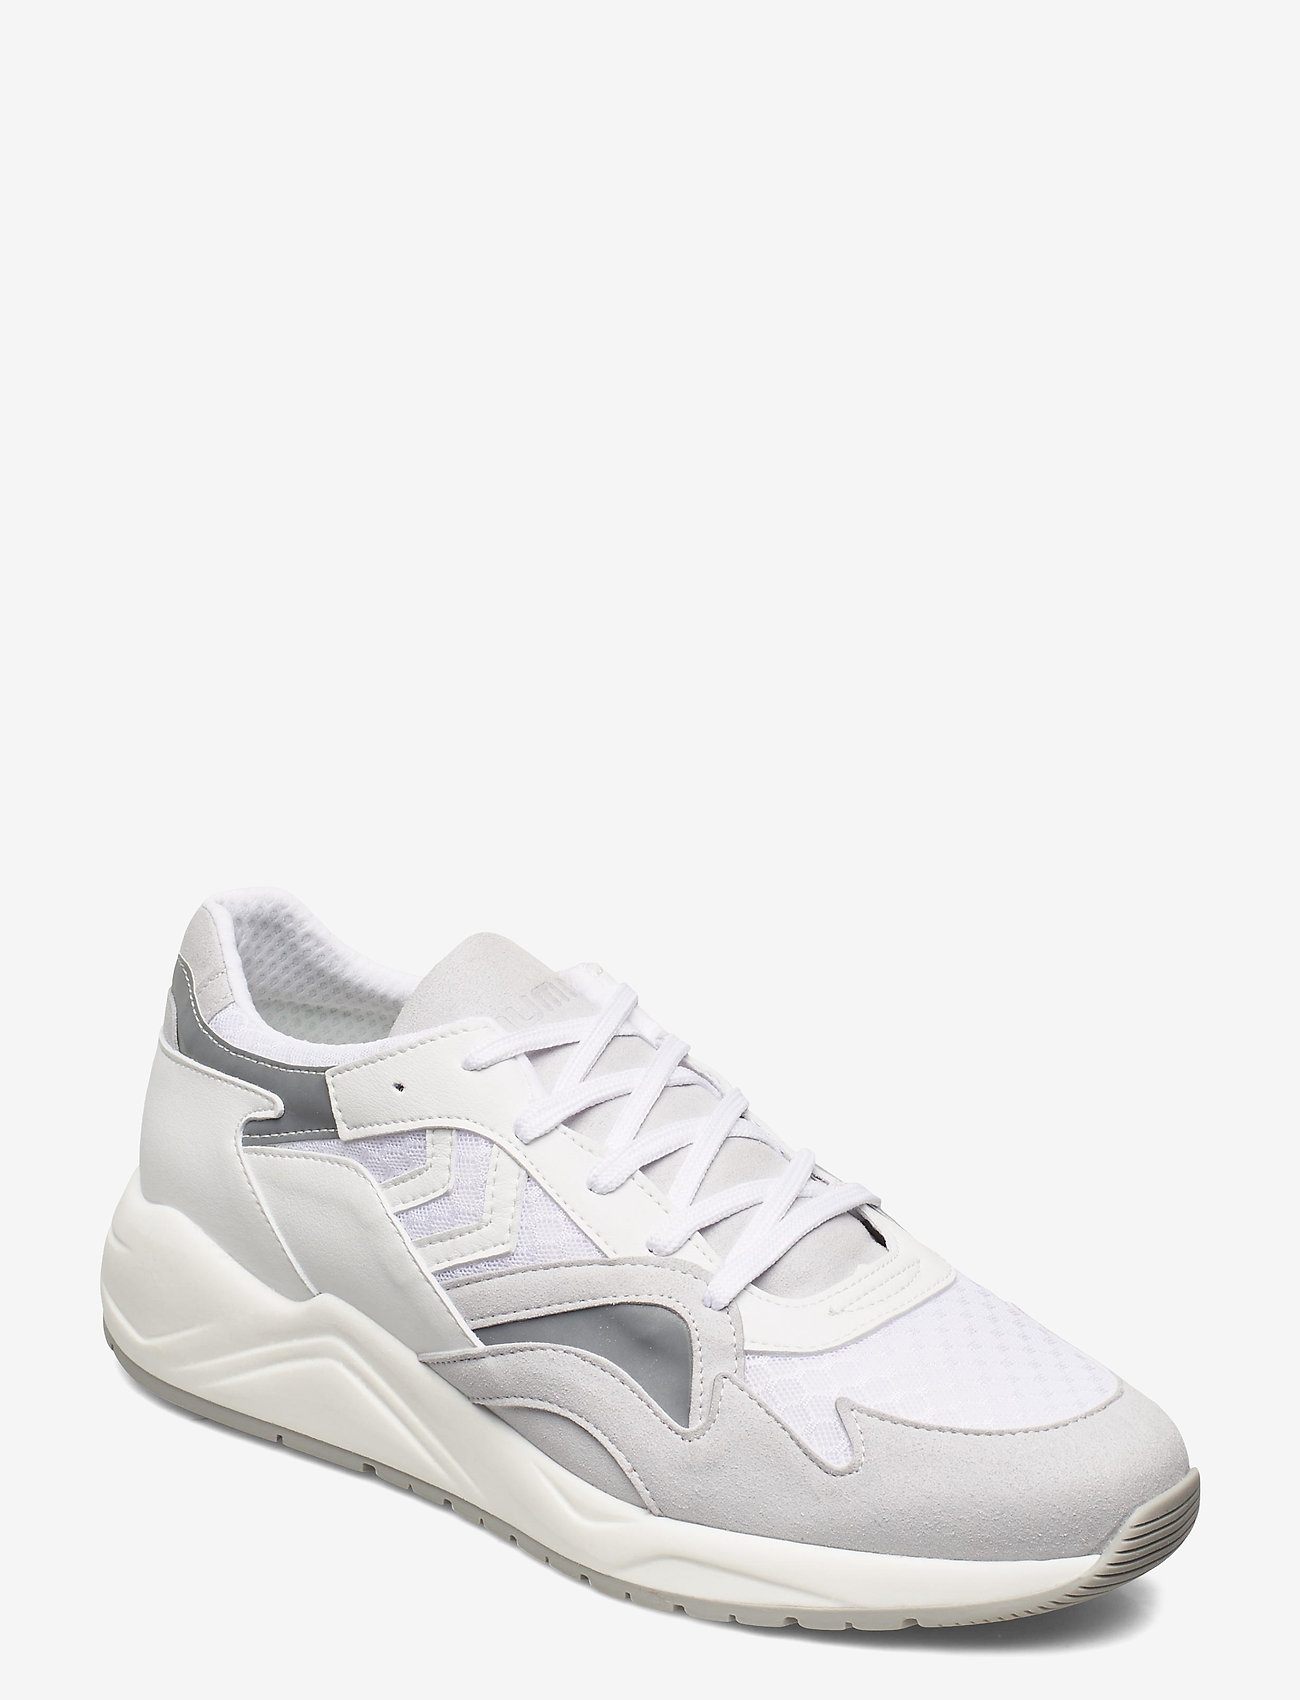 Hummel - EDMONTON PREMIUM - baskets basses - white - 0